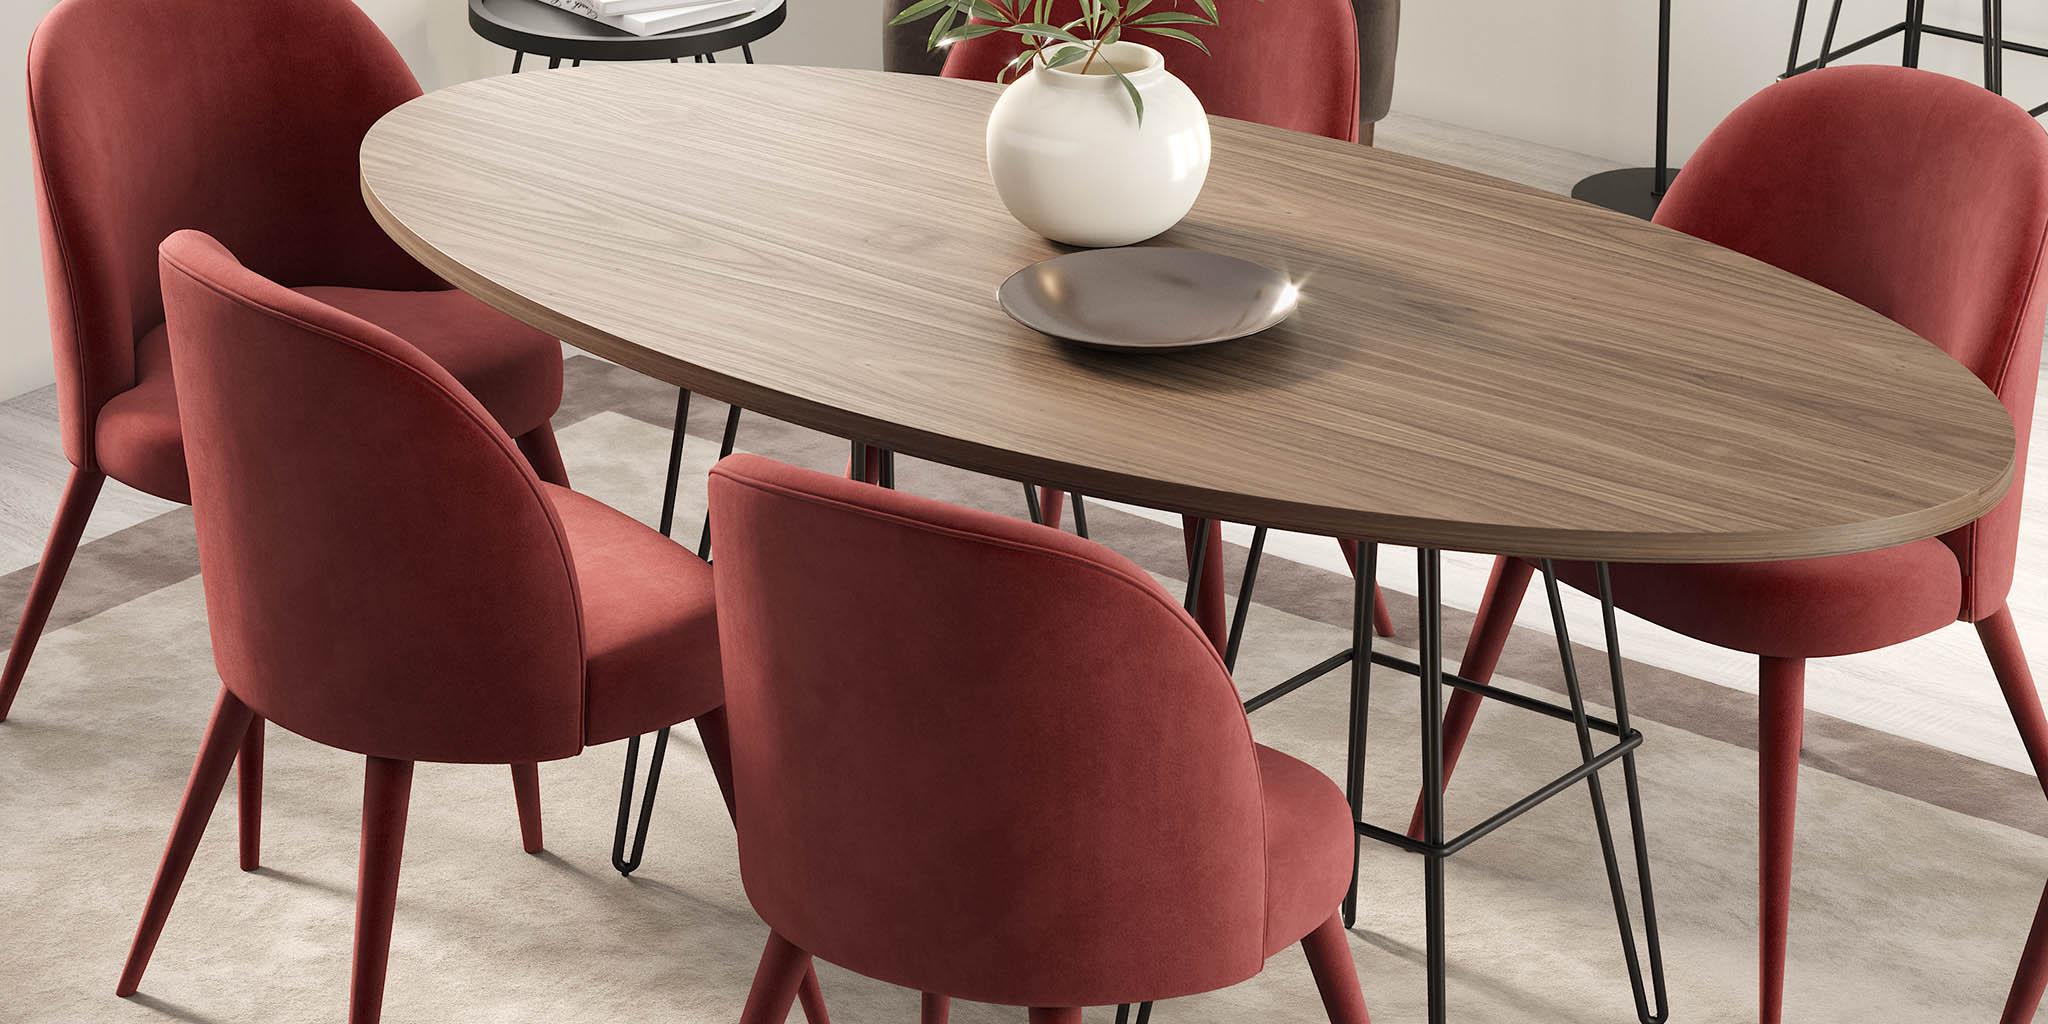 mesa-de-jantar-oval-madeira-base-ferro-preto